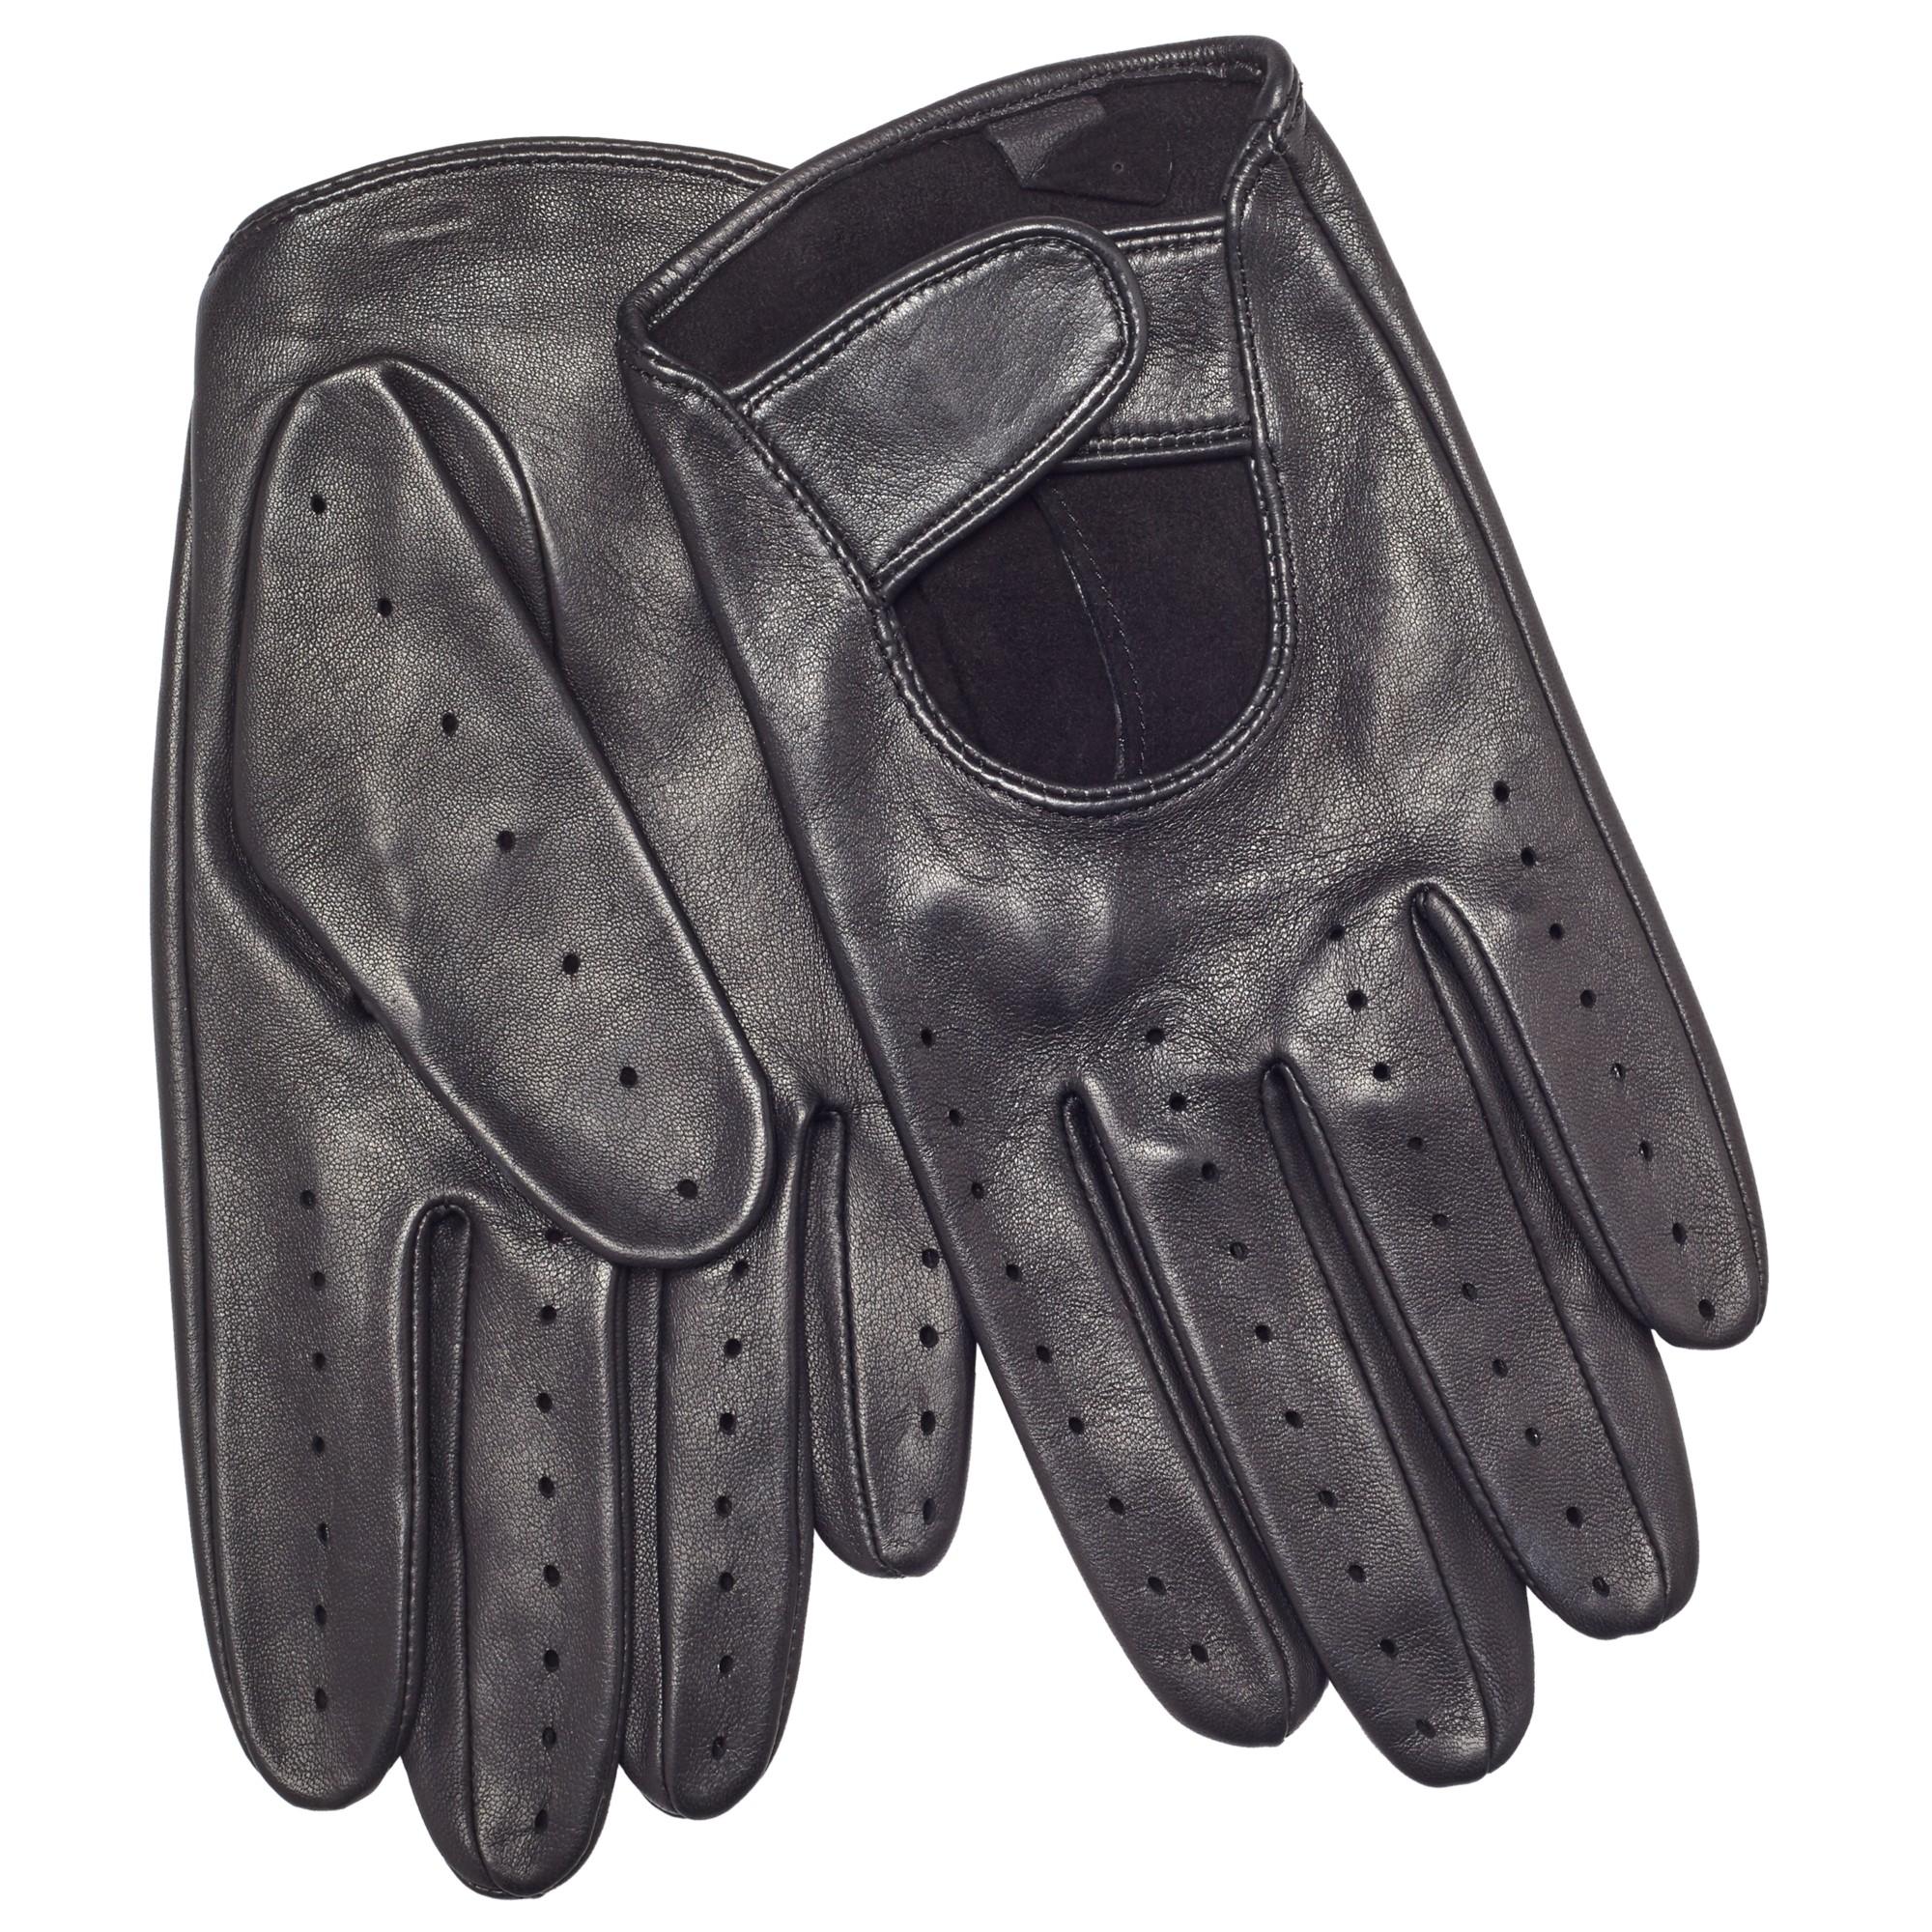 John lewis leather driving gloves - John Lewis Men S Black Leather Driving Glove